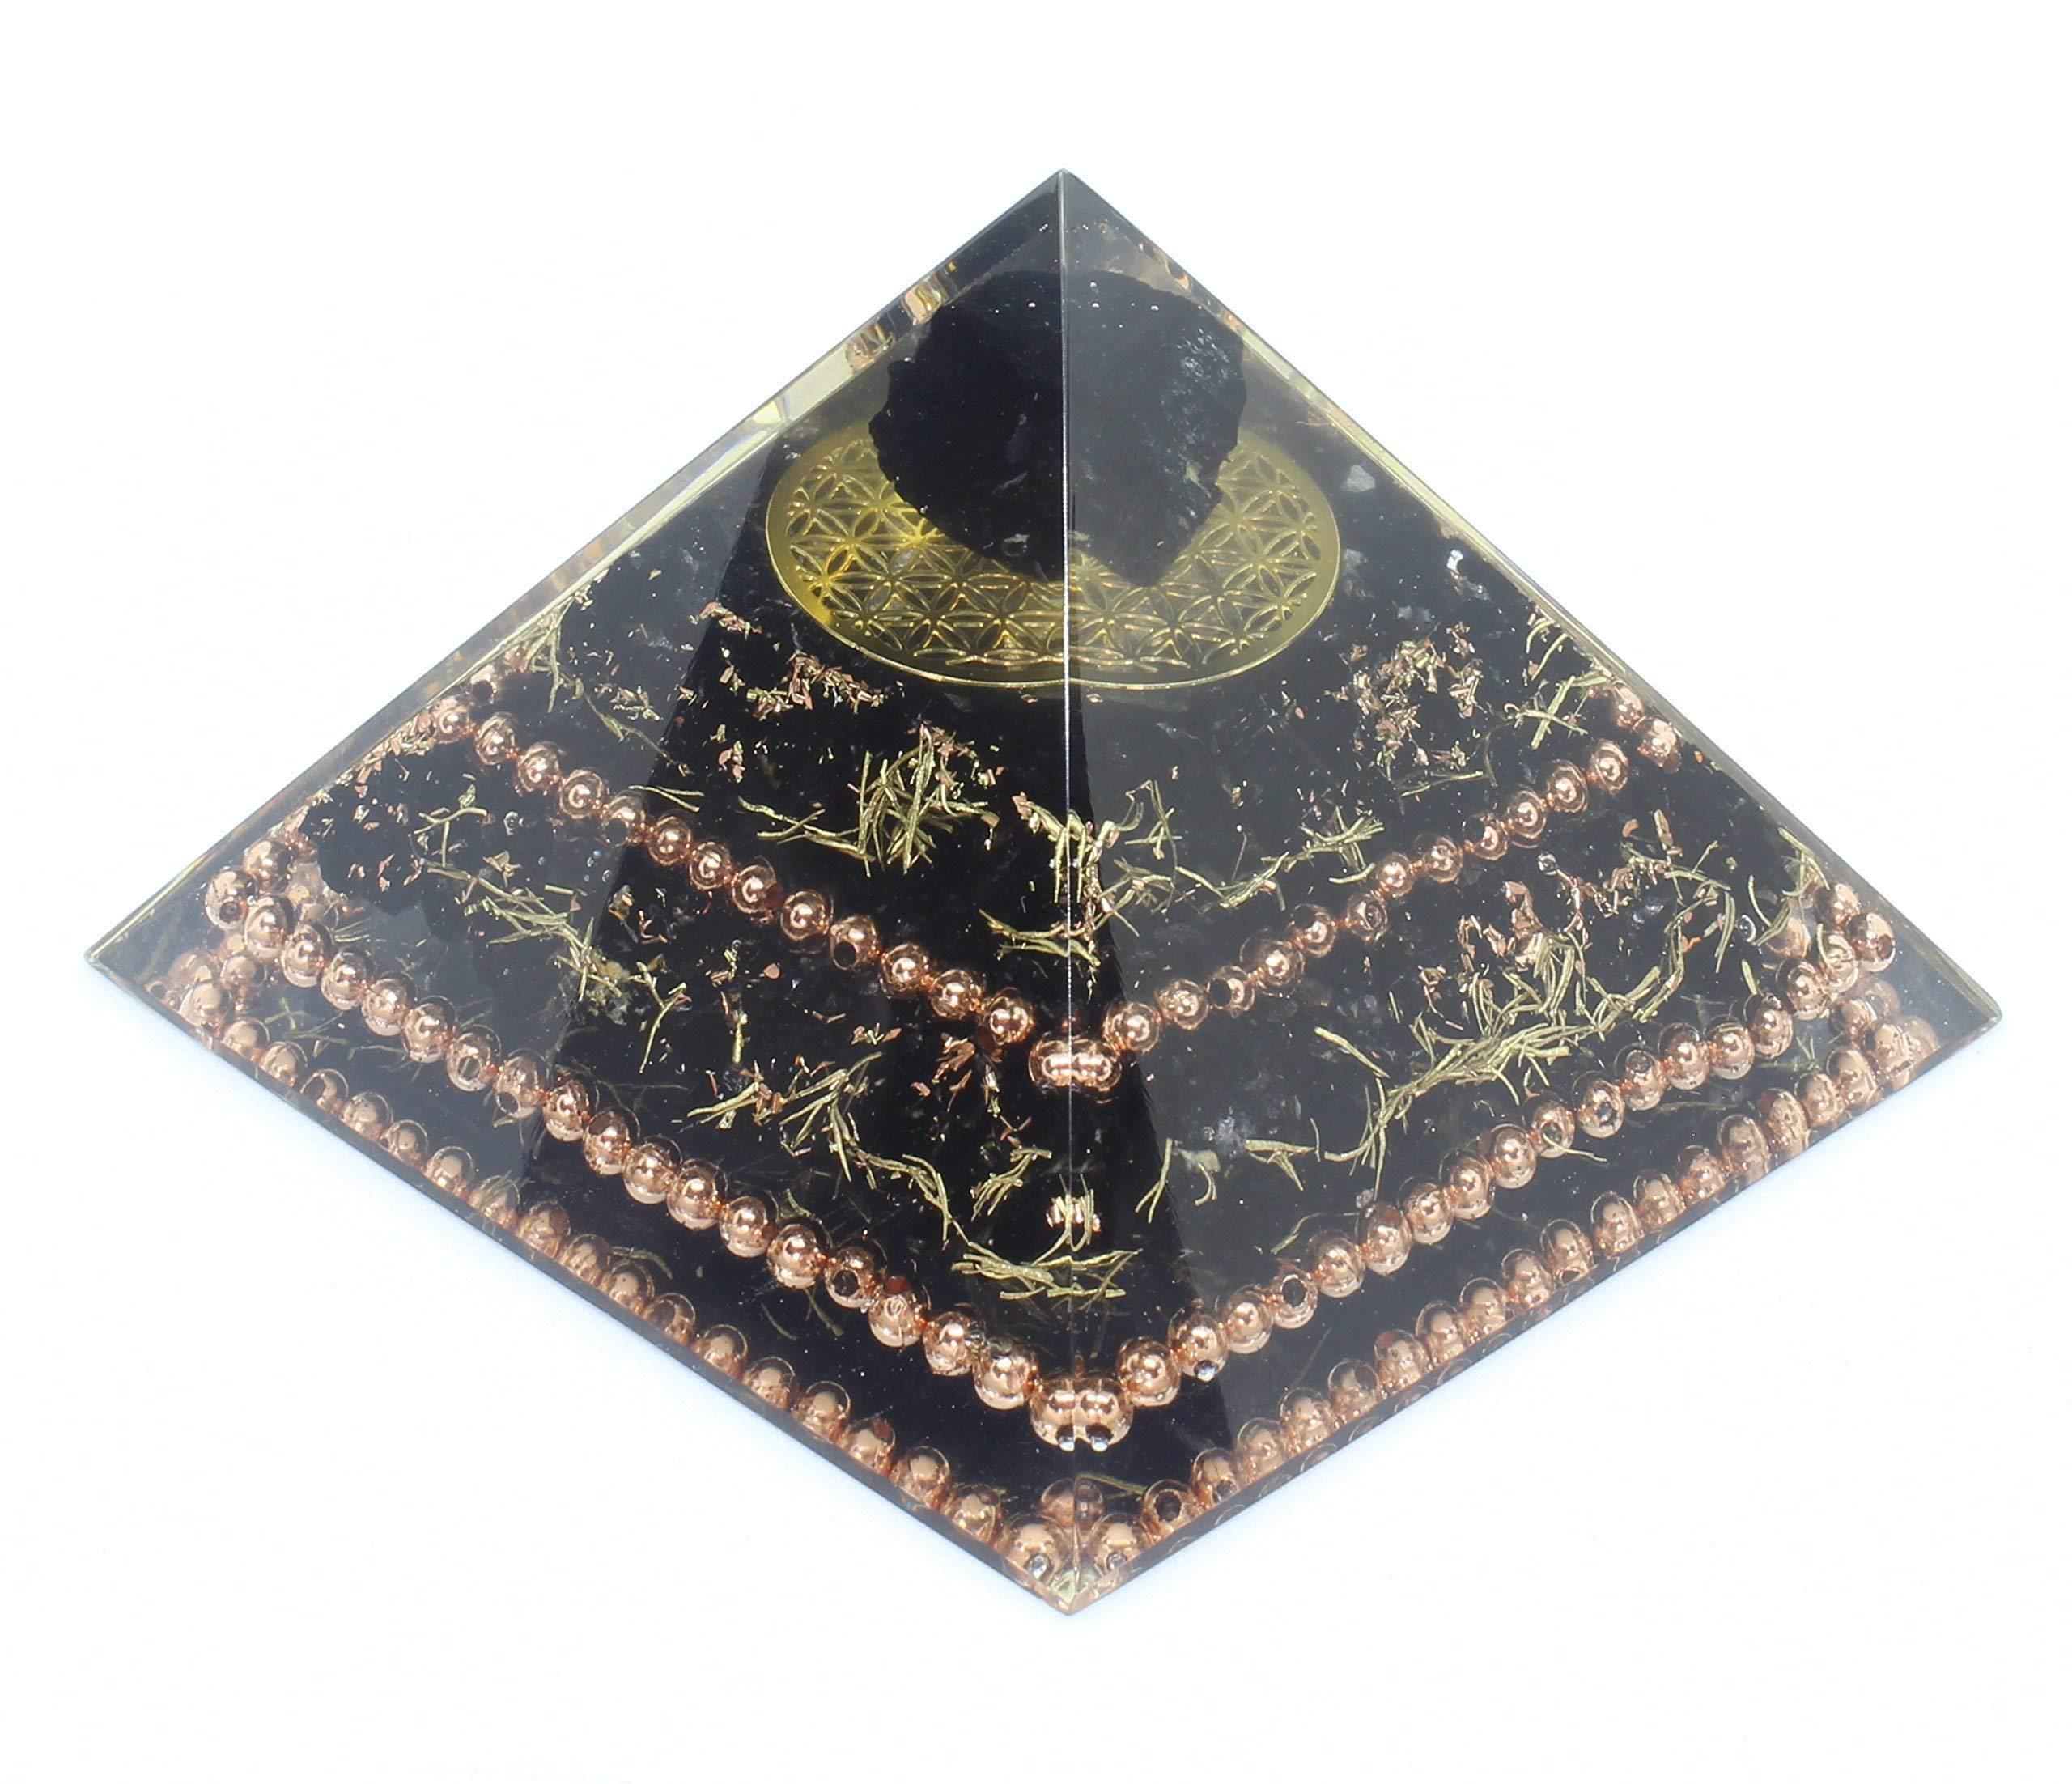 Flower of Life Black Tourmaline Copper Orgone Healing Pyramid for Balance Stress Inner Psychic Meditation